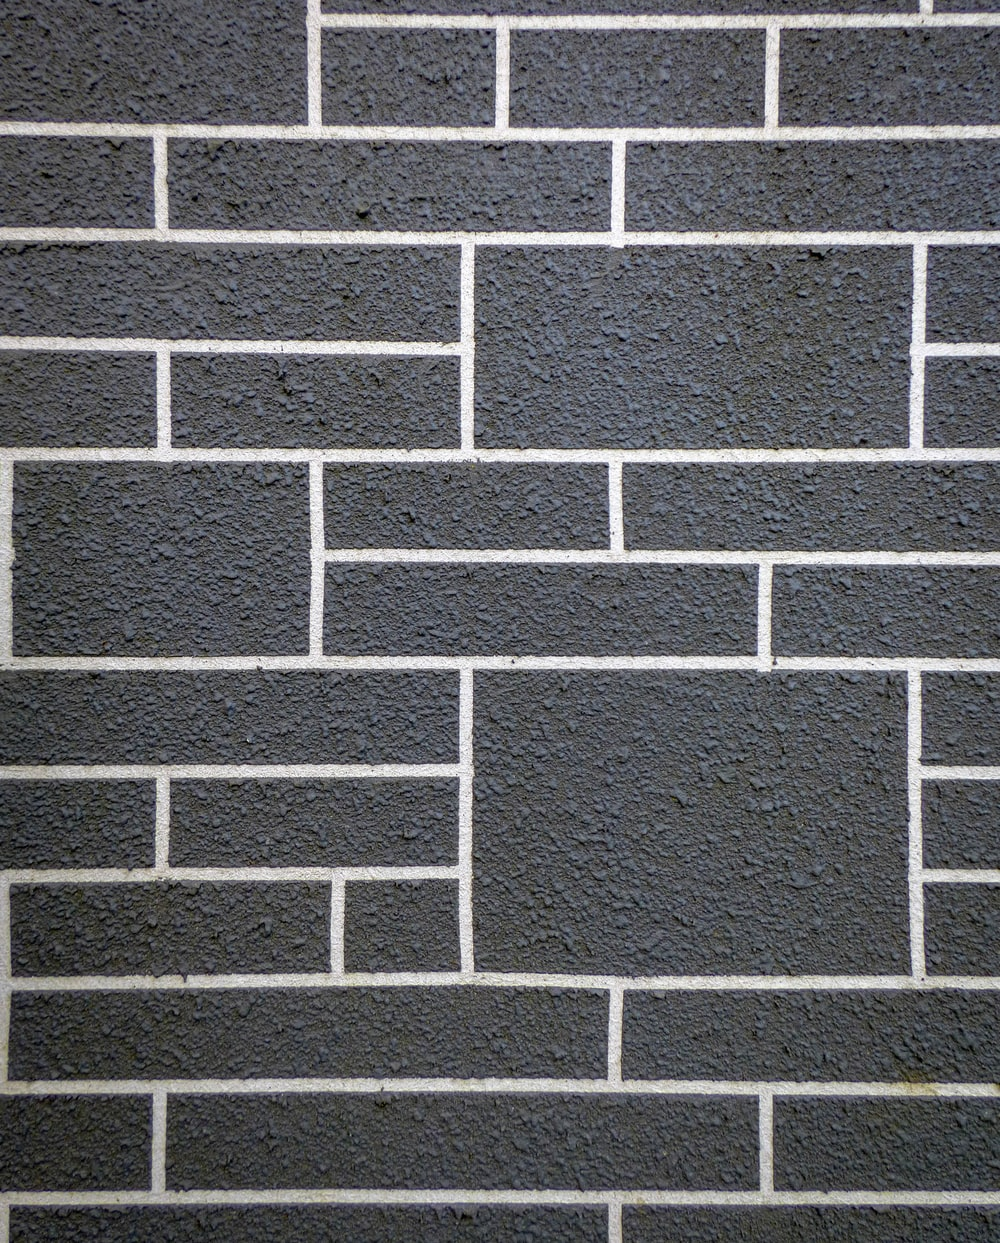 gray and white brick wall